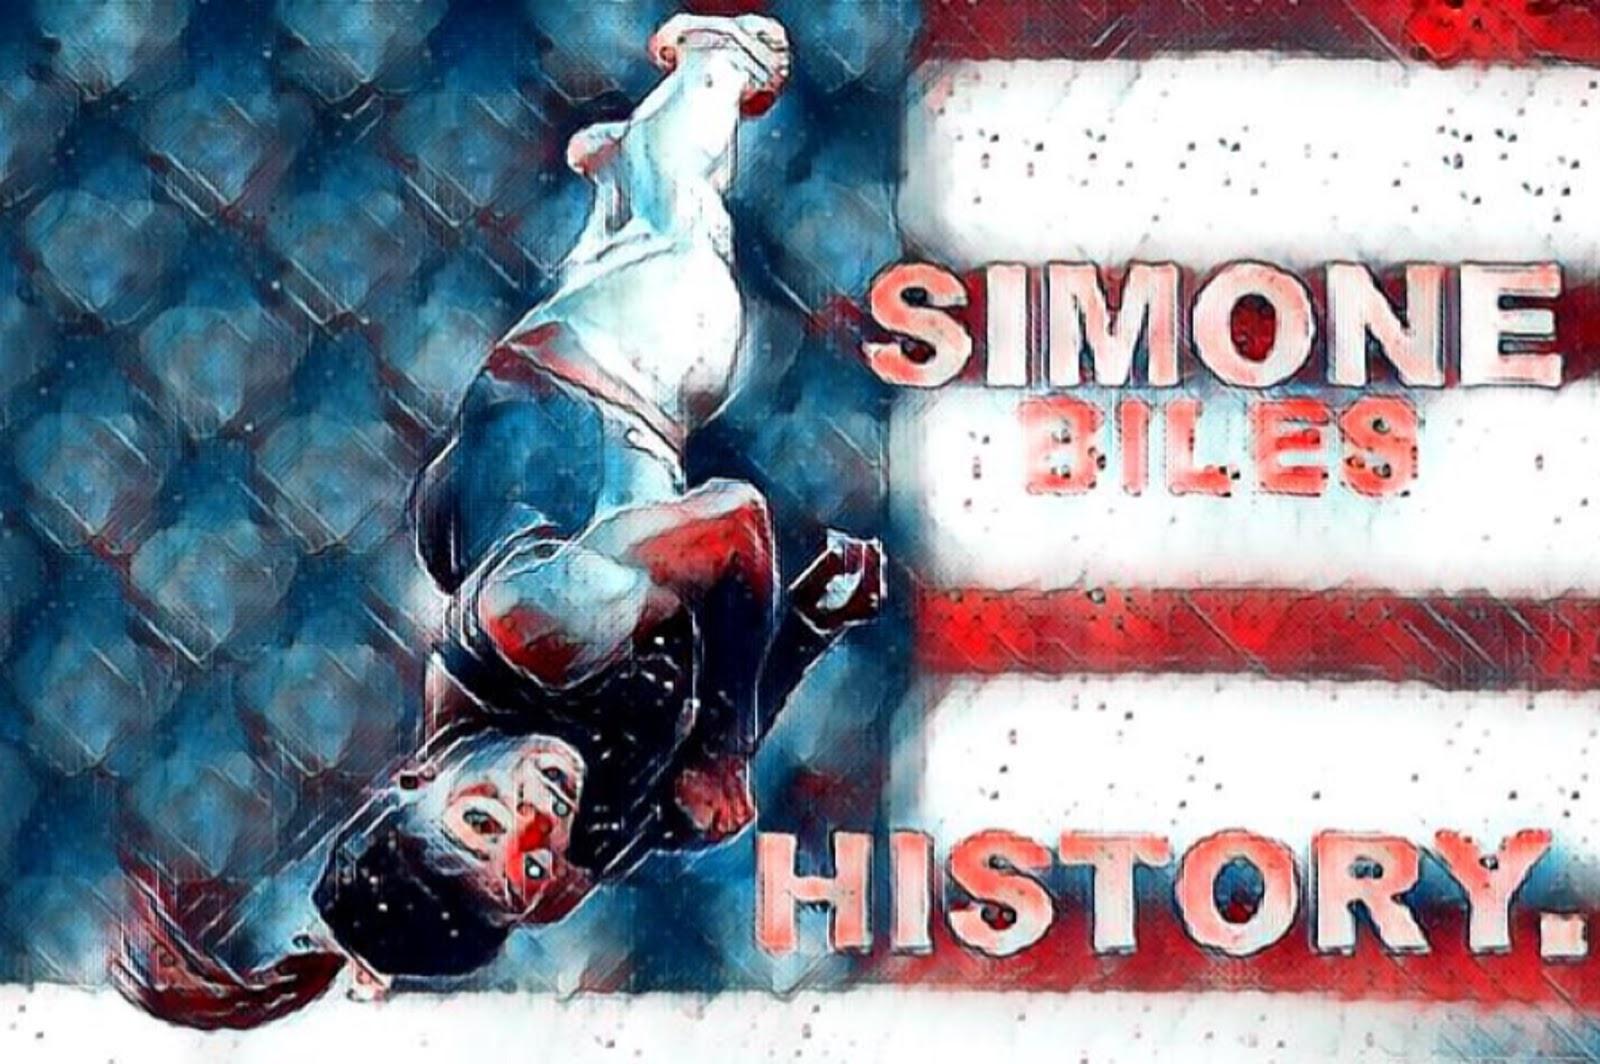 SIMONE BILES 4